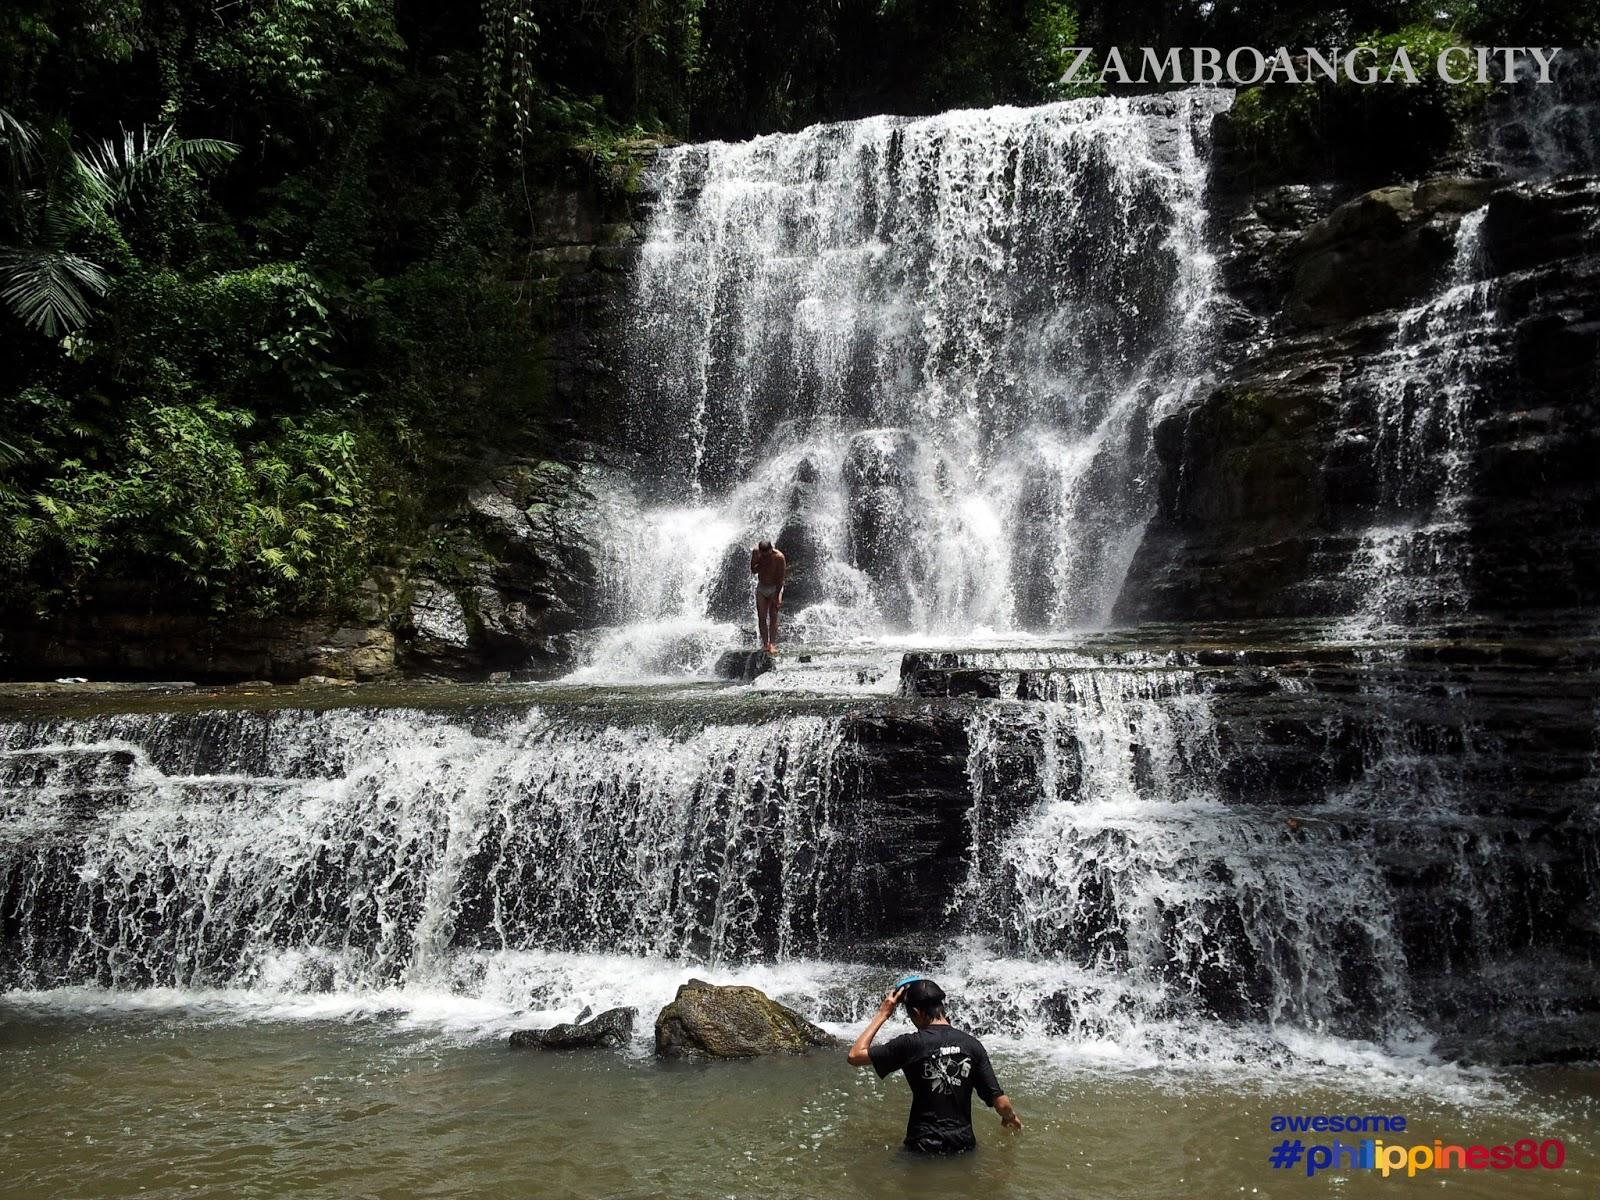 Filipinas Beauty Merloquet Falls Sibulao Zamboanga City Philippines